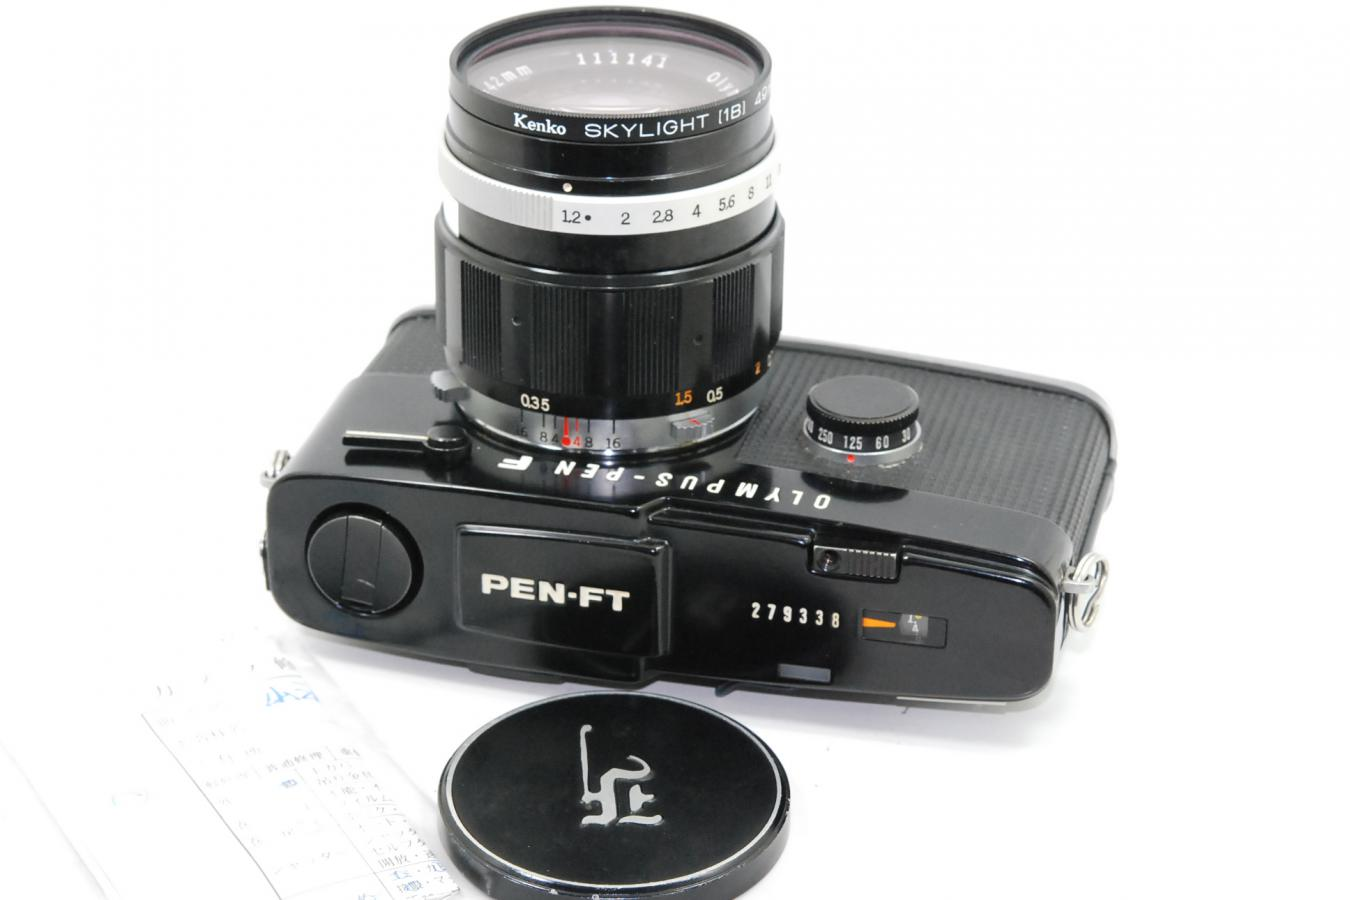 OLYMPUS PEN-FT ブラック H.Zuiko Auto-S 42/1.2付 【整備済 ケンコー製49mmスカイライトフィルター付】